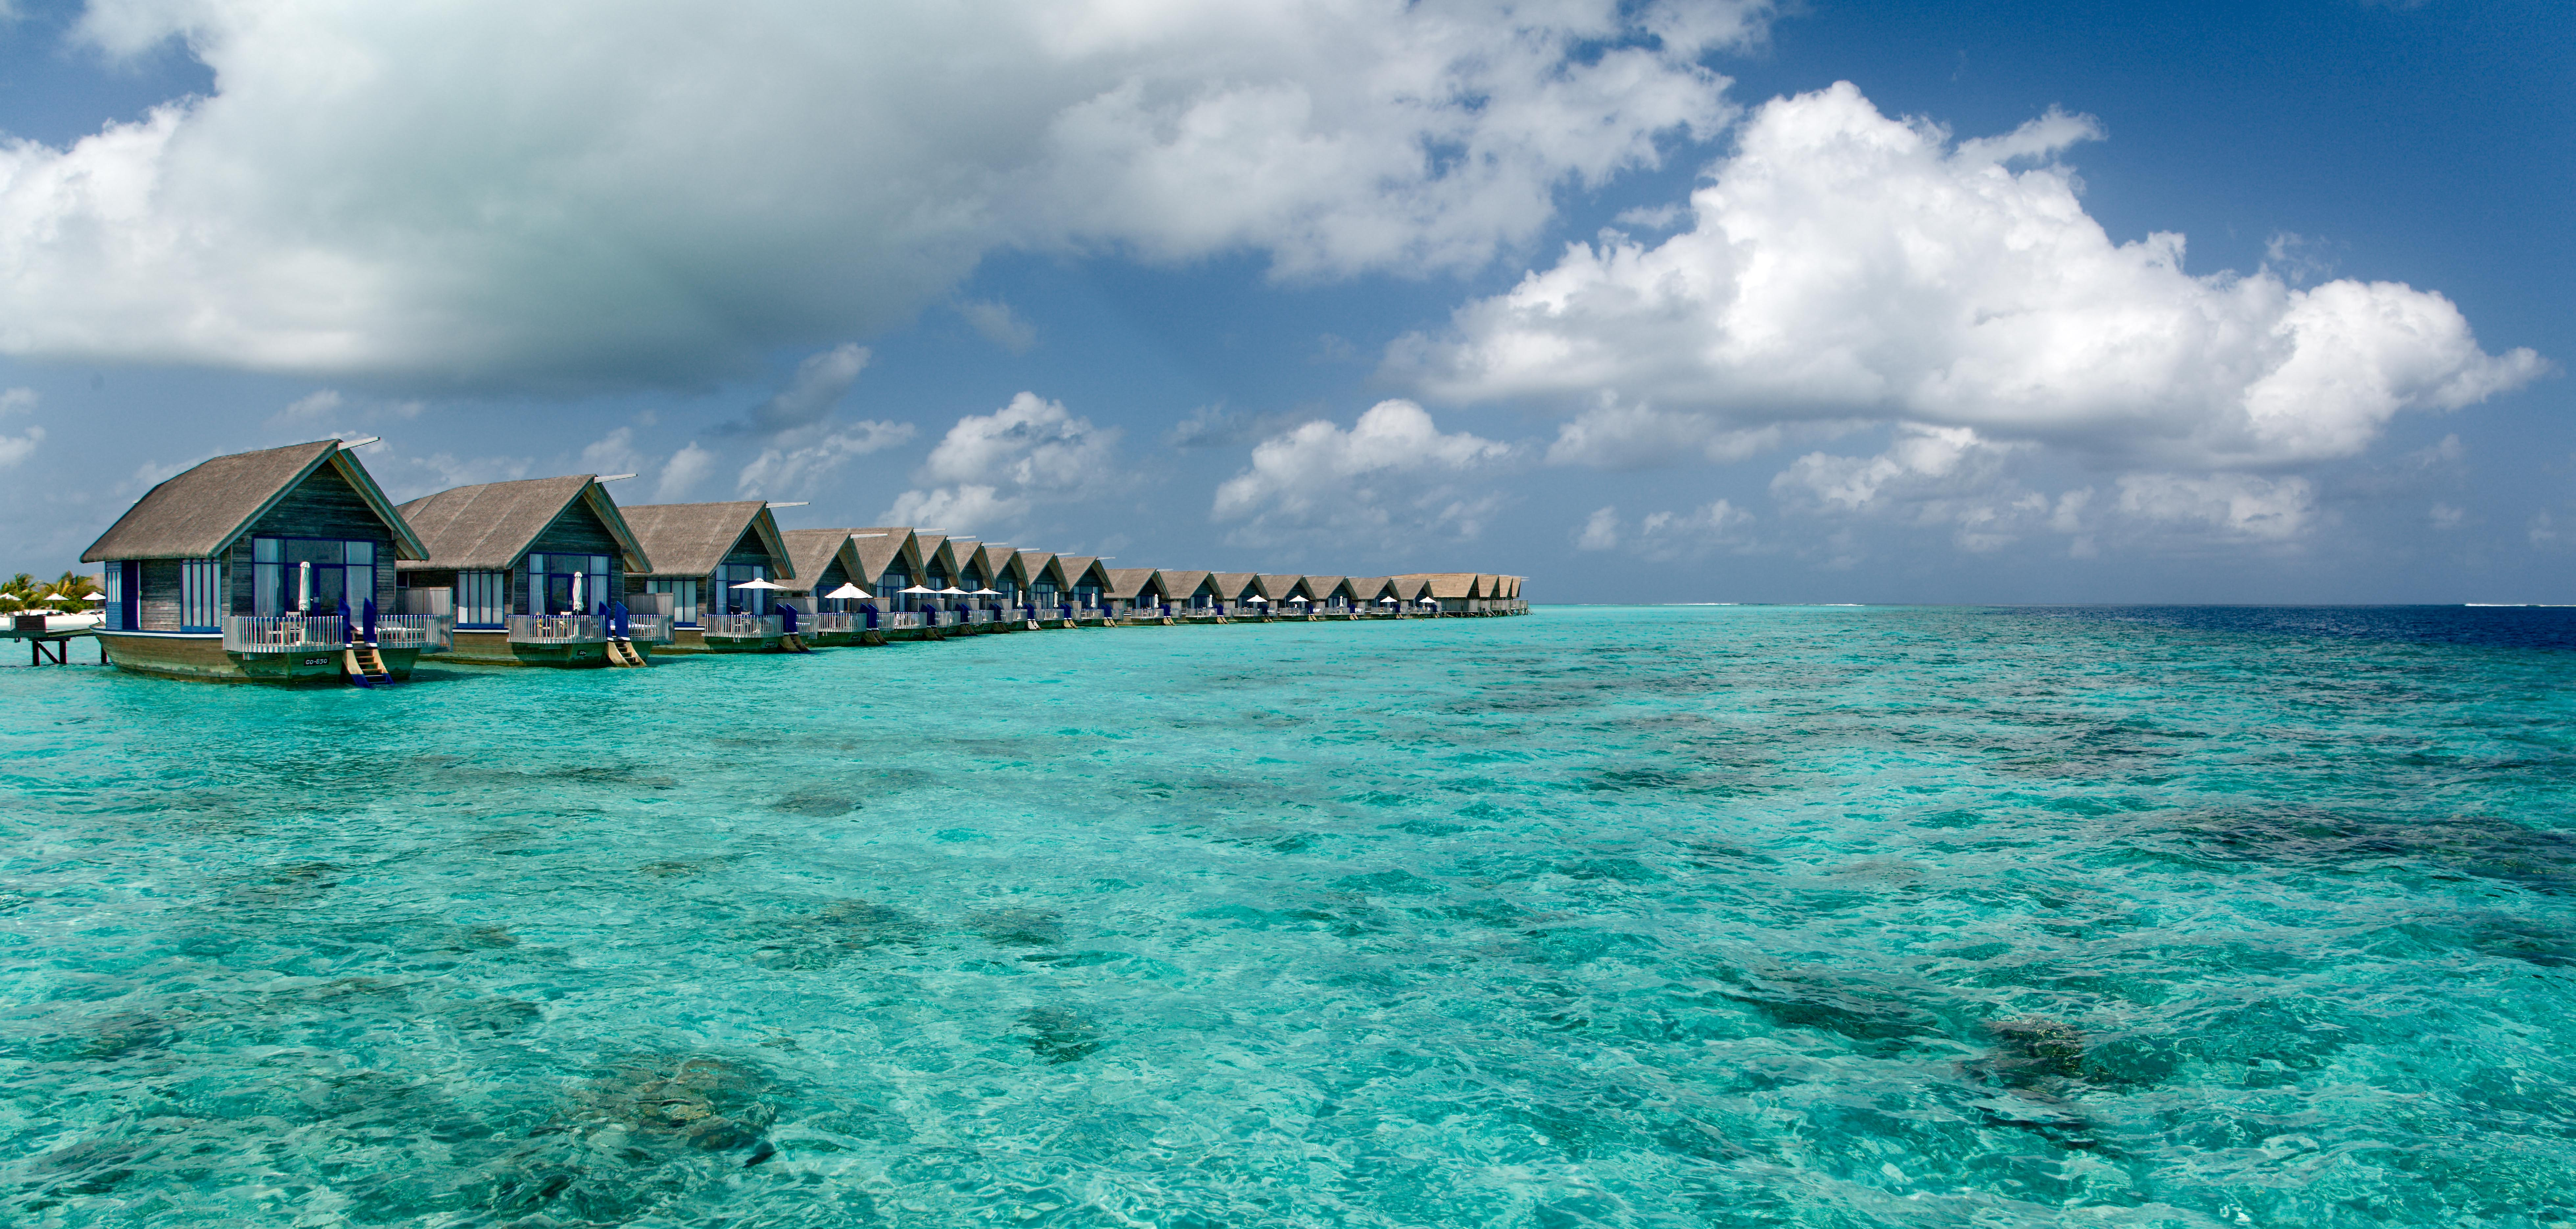 Palau Beach Resort Calatrava Room Rates